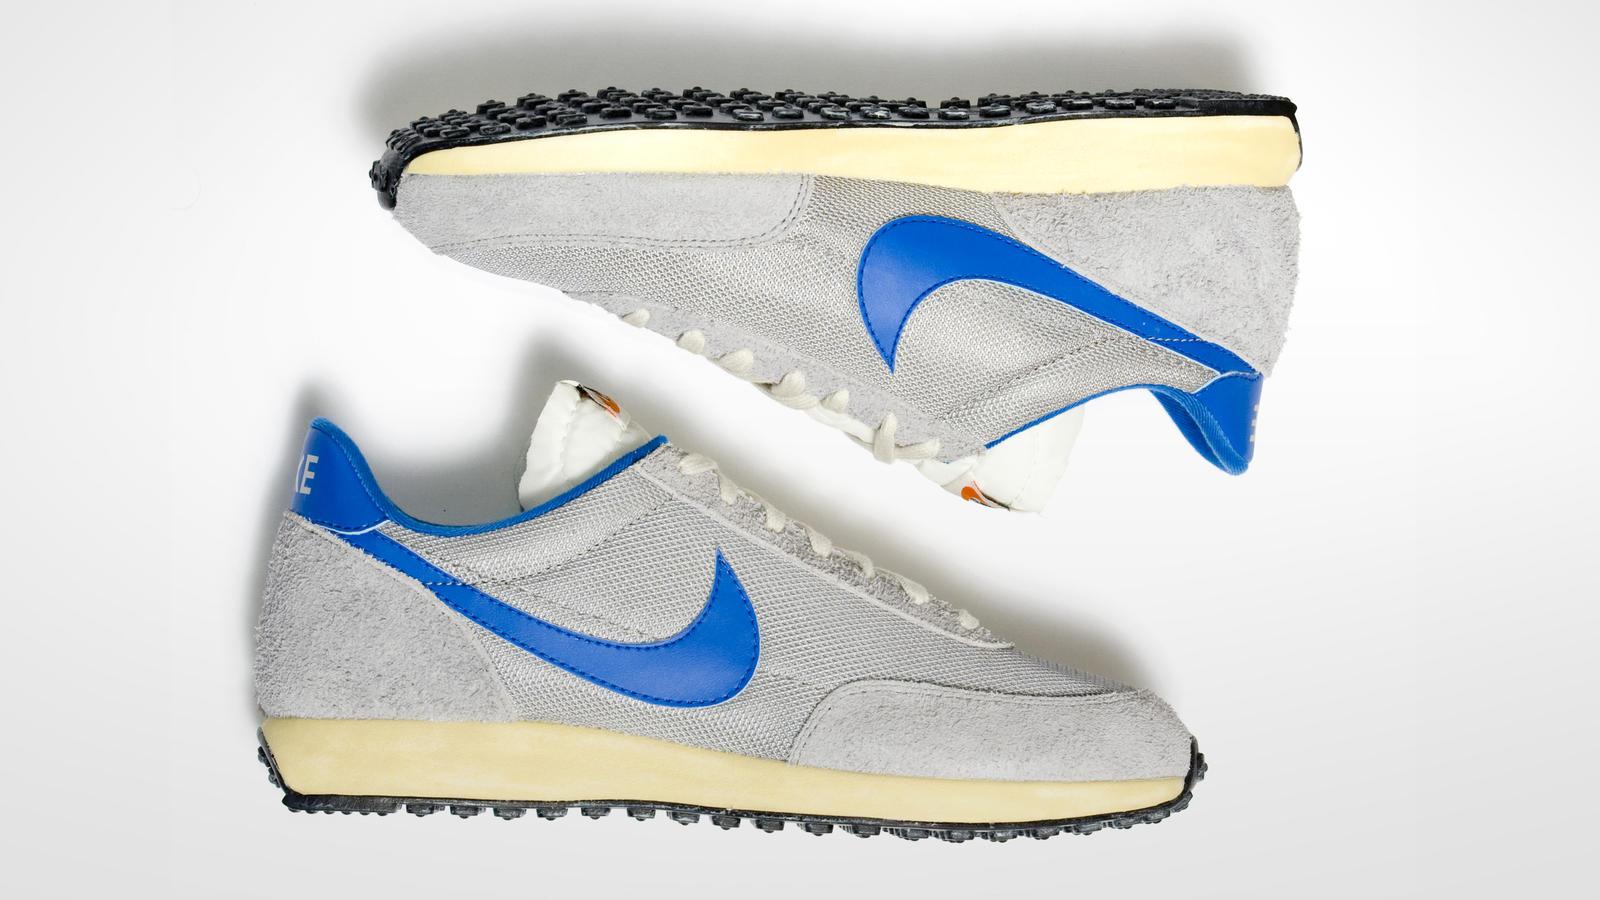 hot sales 18e6f e8771 Reintroducing the Nike Tailwind - Nike News